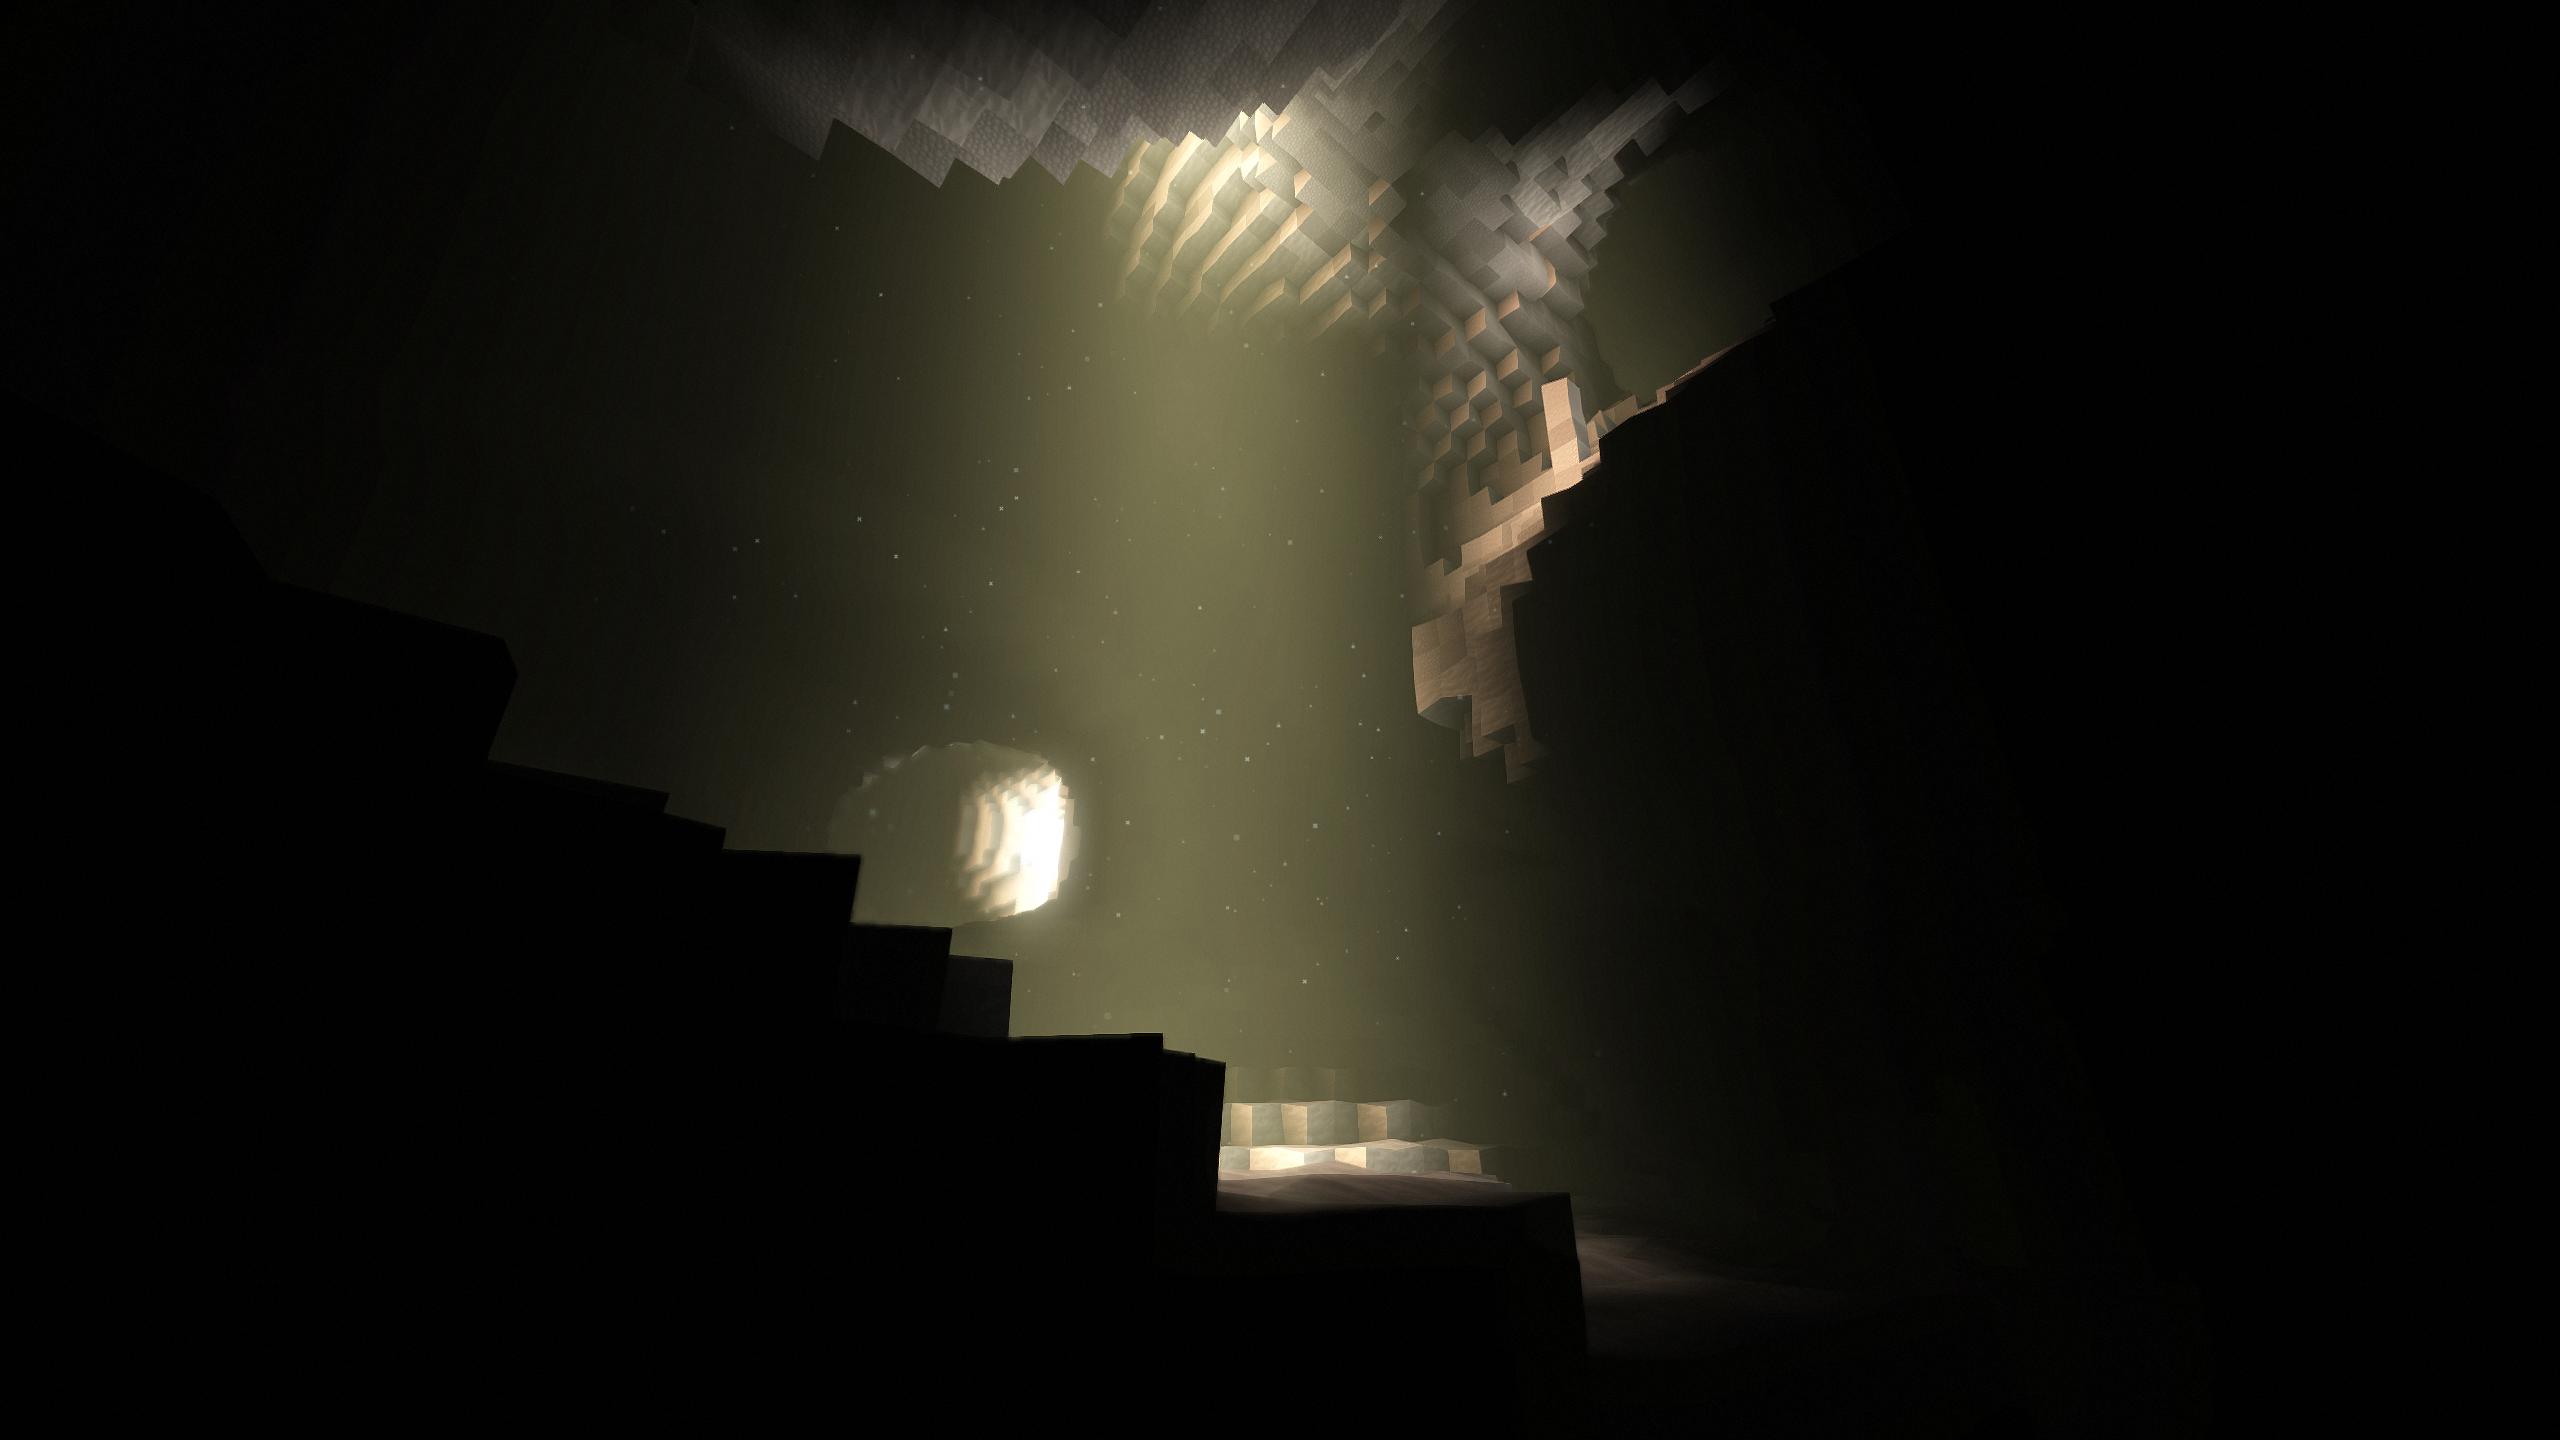 Screenshot Atmospheric cave lighting & Screenshot: Atmospheric cave lighting | Boundless u2013 Explore ...